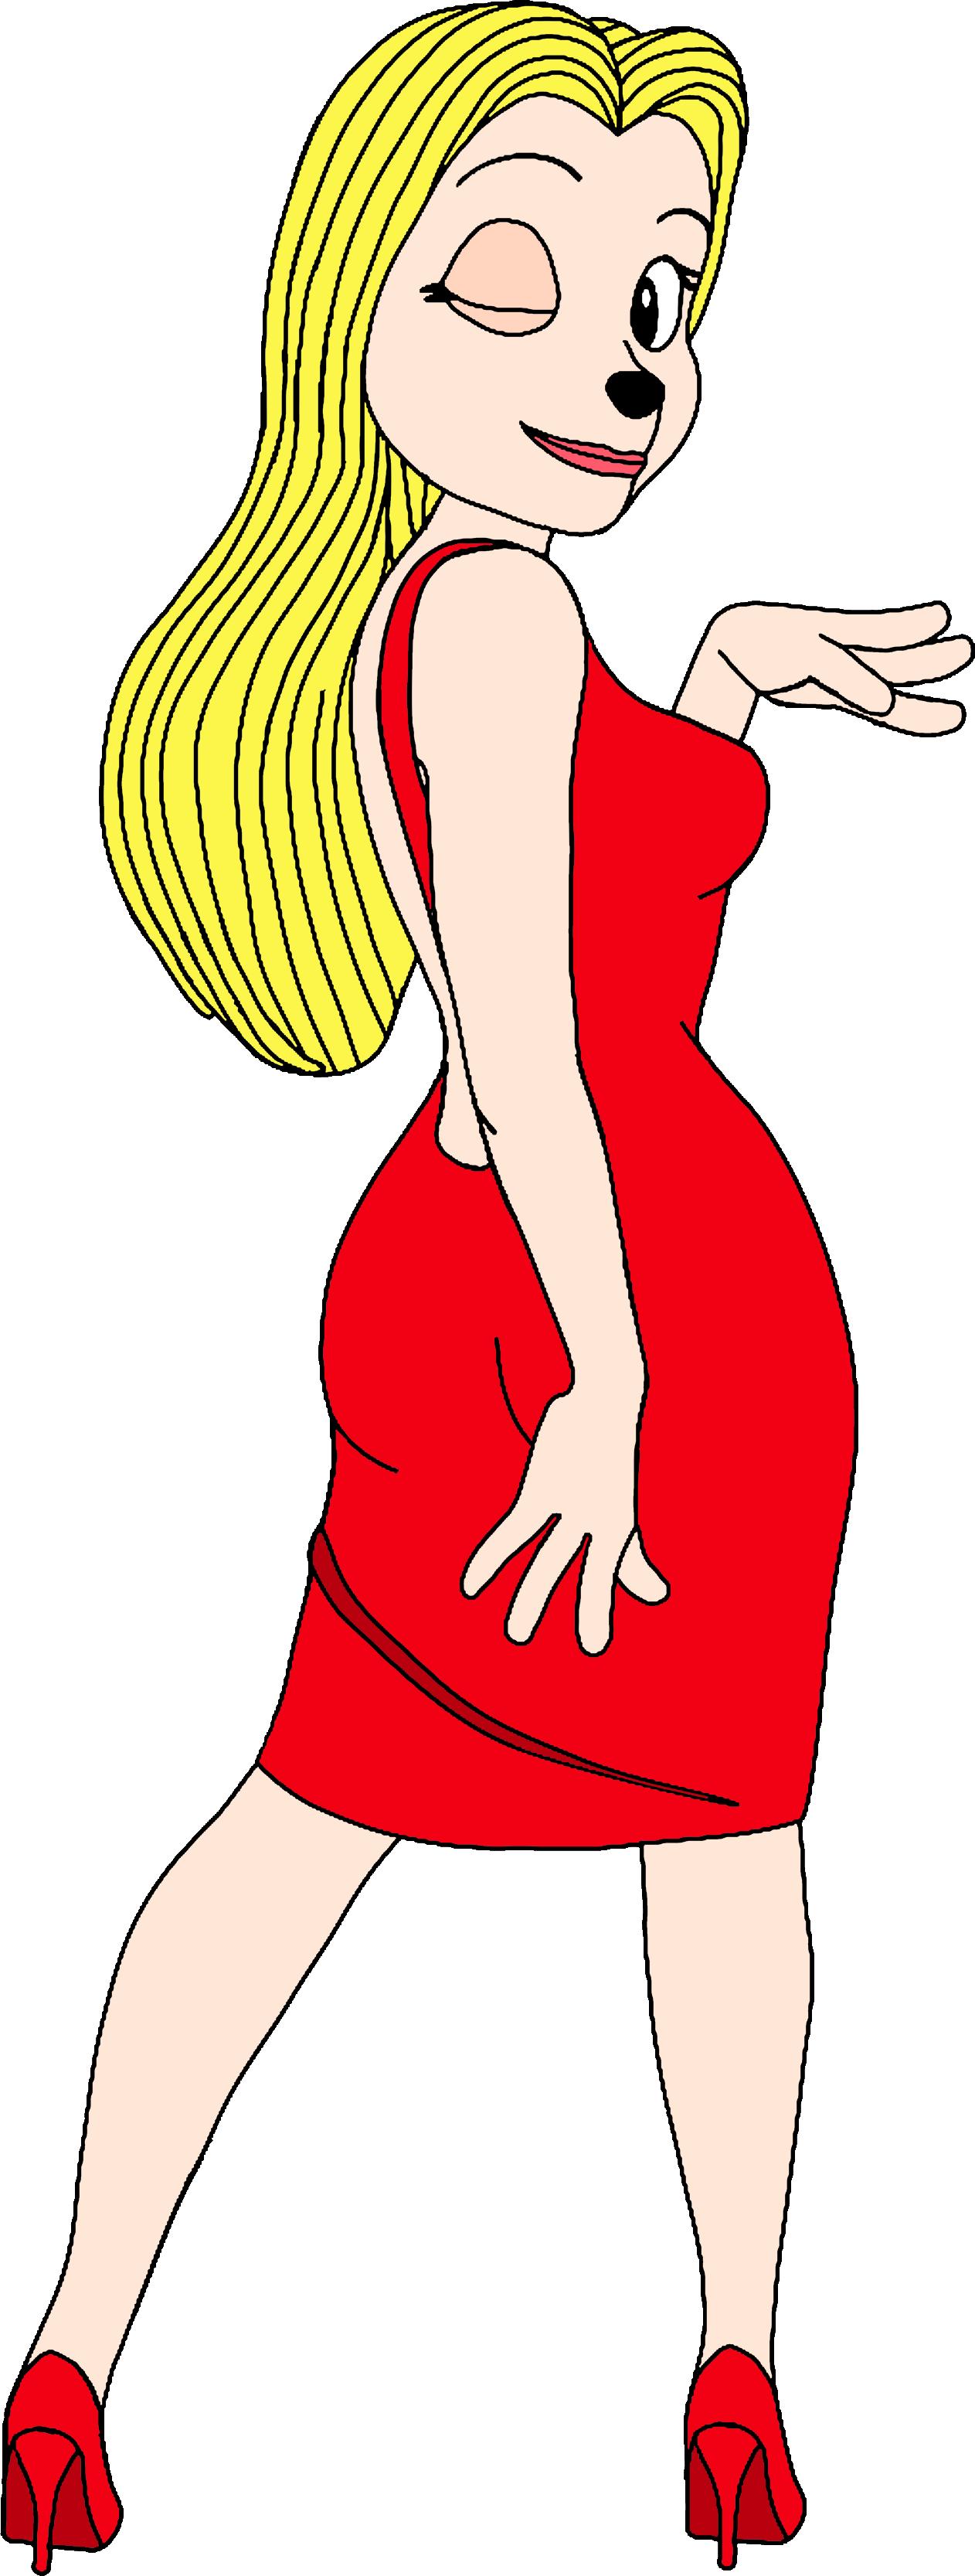 Heartfilia Macpoodle/Outfits